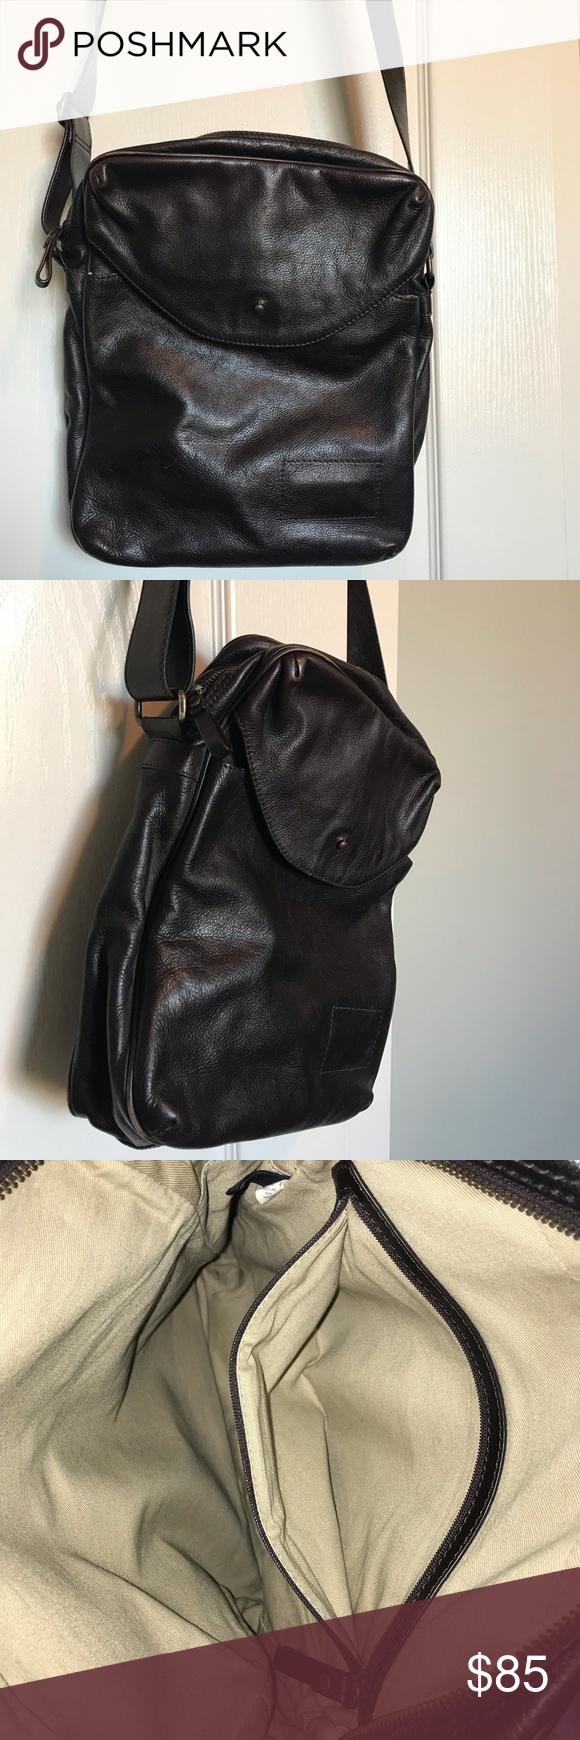 Banana Republic brown leather messenger bag Dark brown, genuine leather  messenger style bag with adjustable a6d114f898